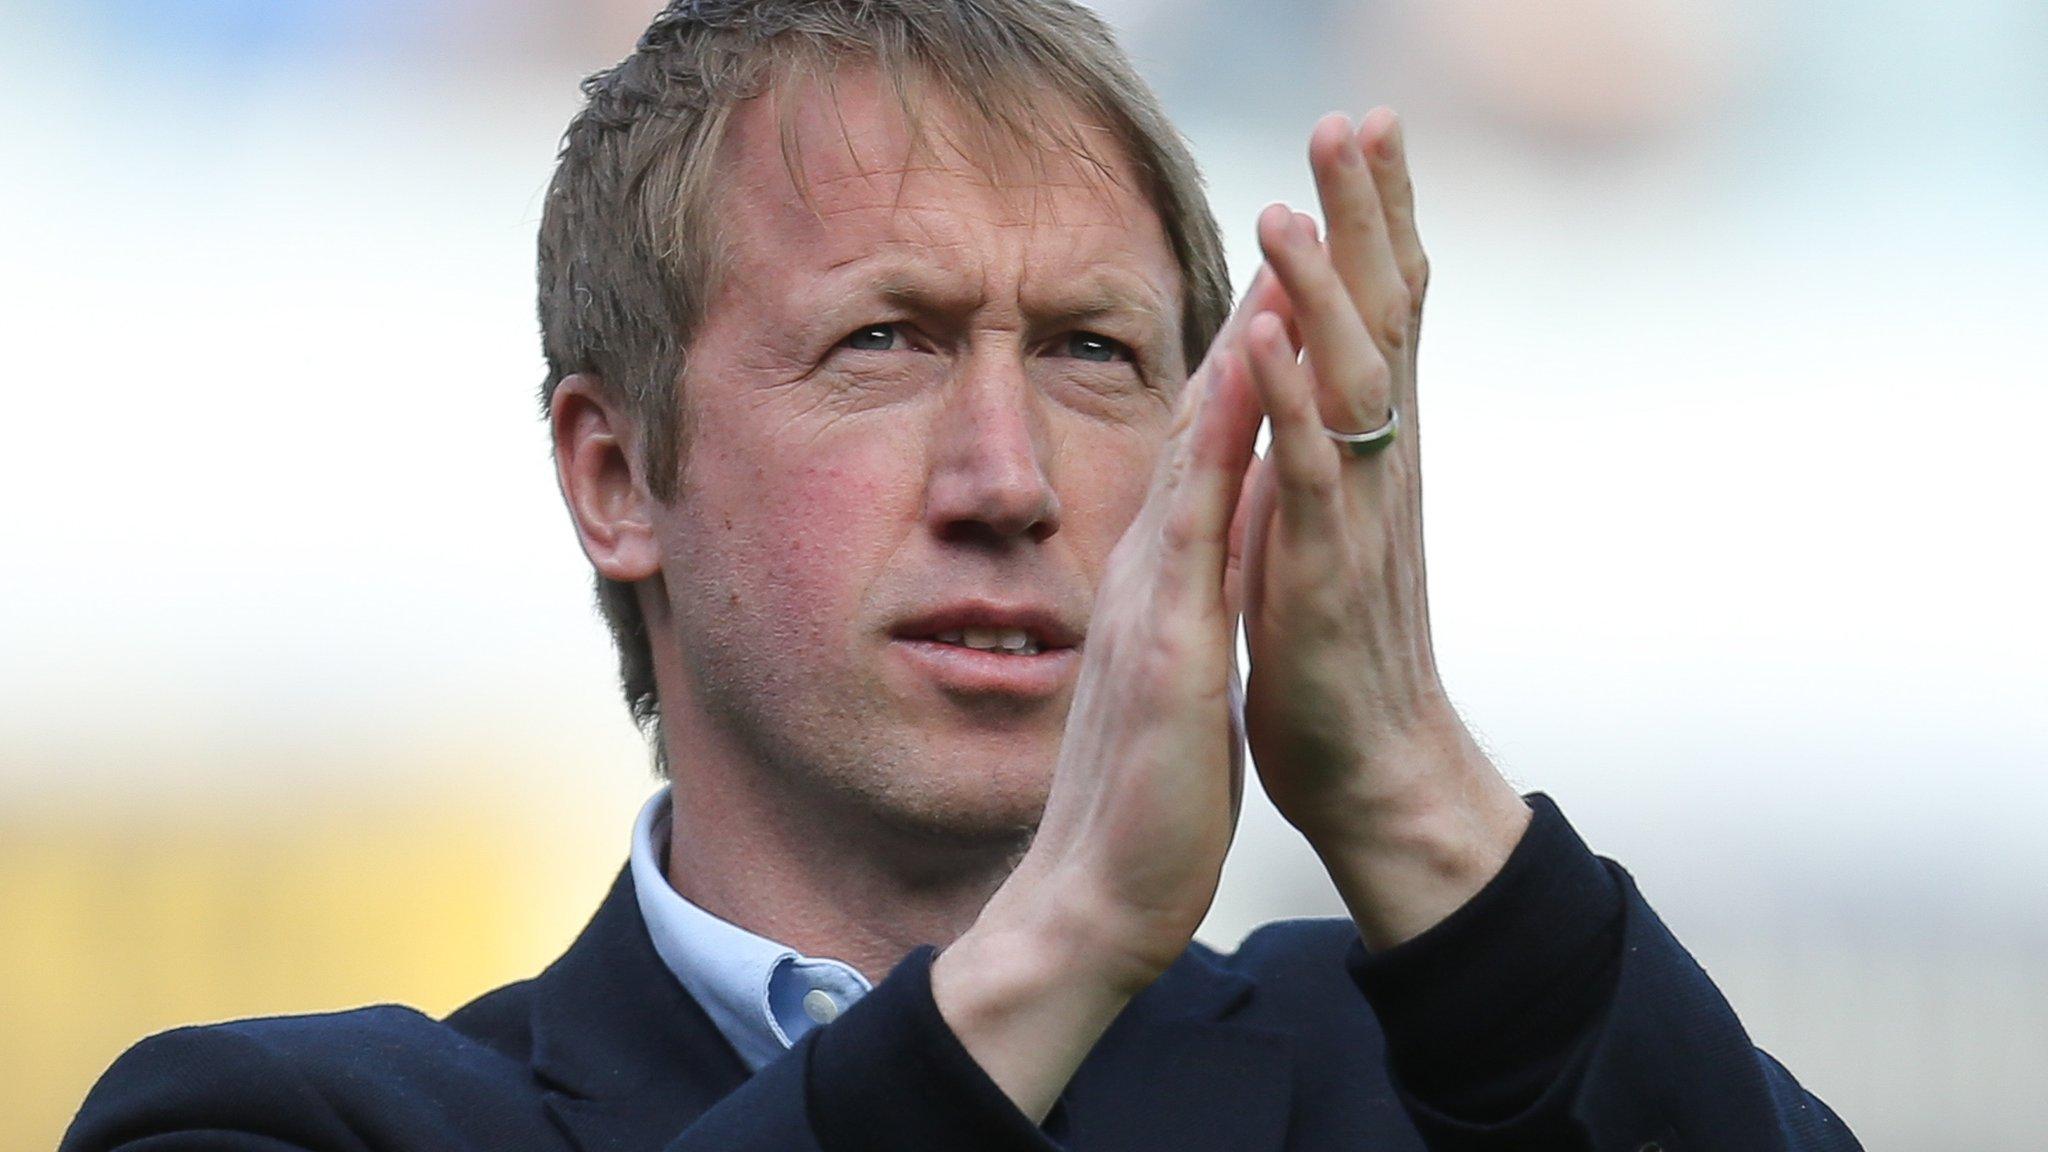 Graham Potter: Swansea City boss plans to stay despite Celtic link